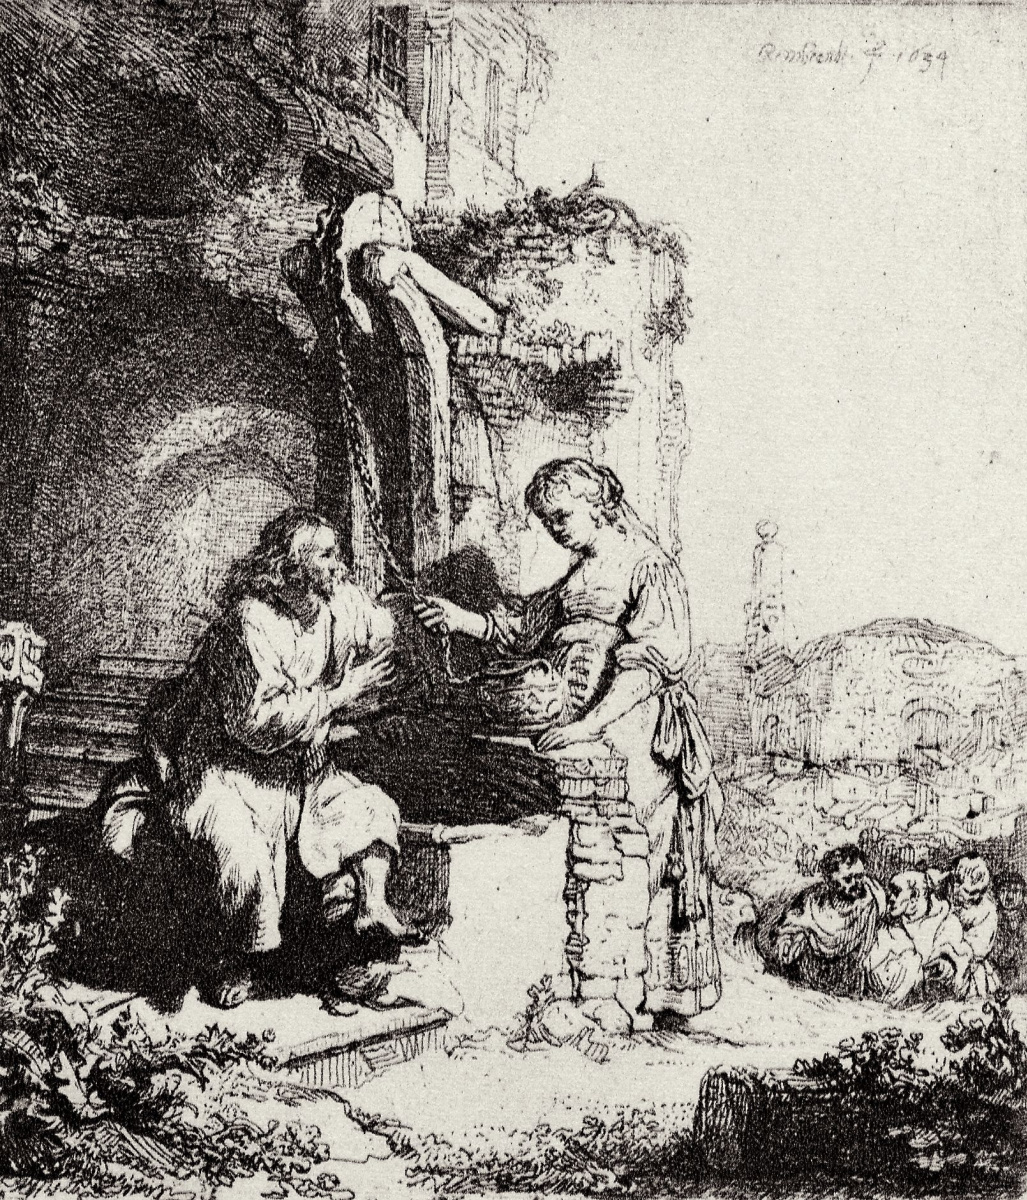 Rembrandt Harmenszoon van Rijn. Christ and the Samaritan woman